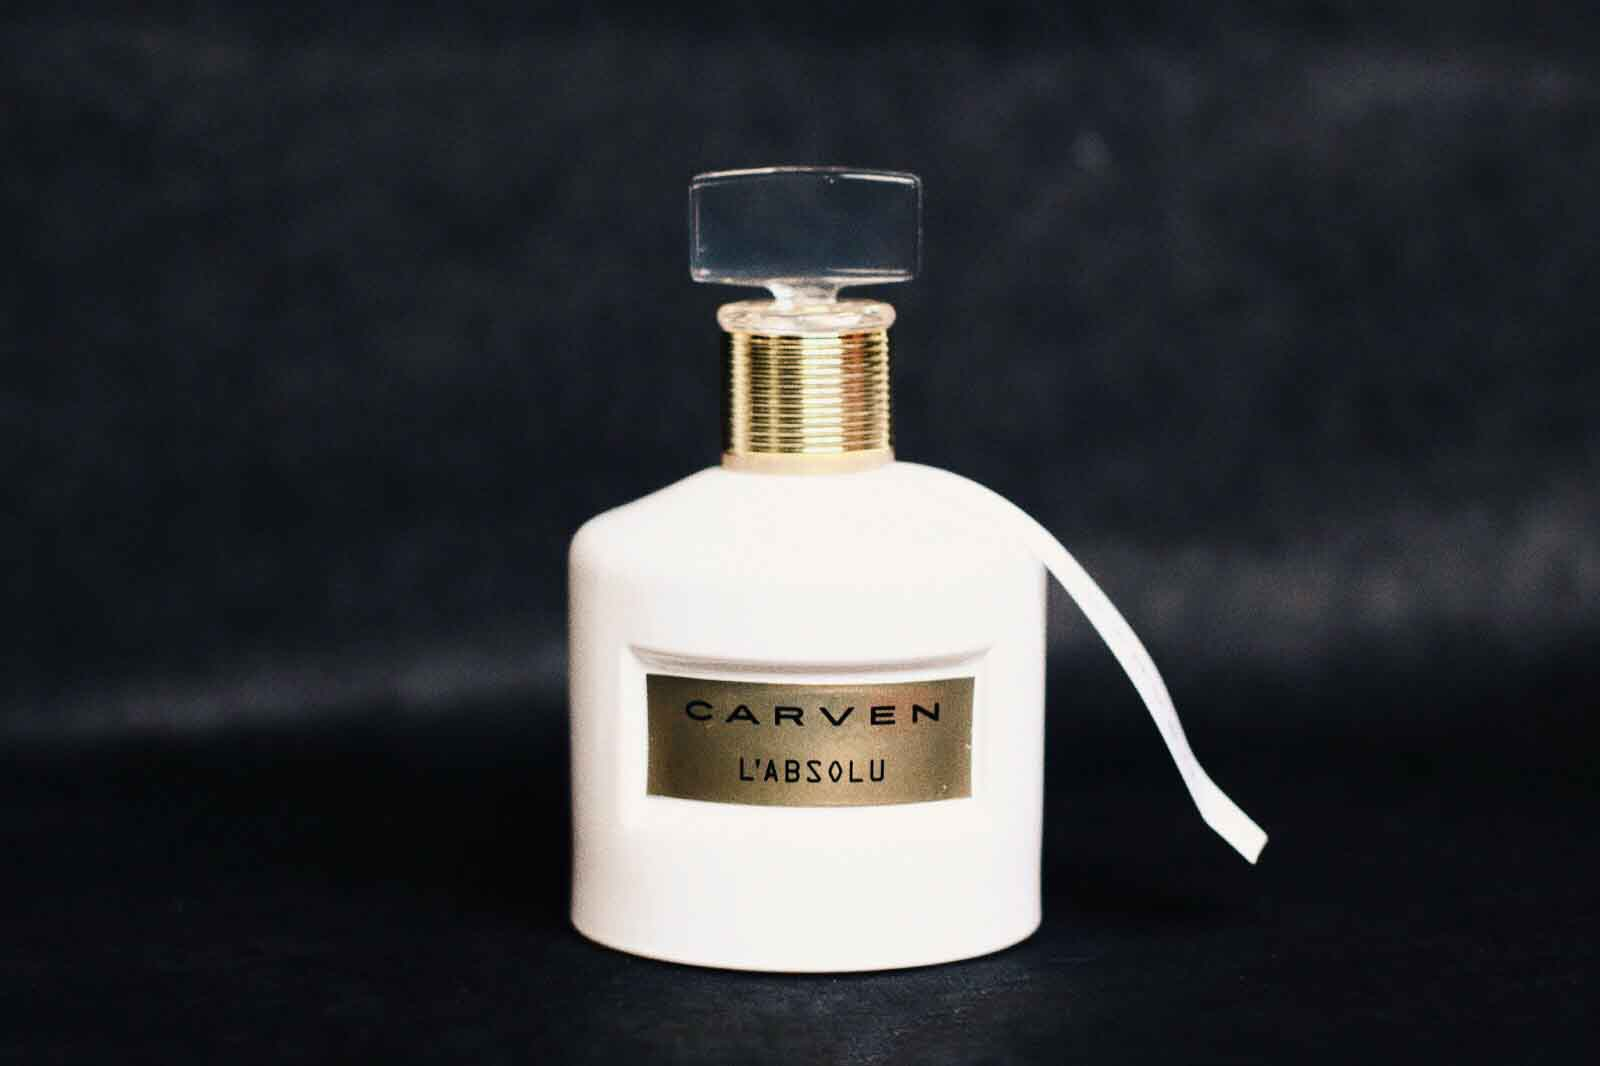 carven l'absolu parfum avis test